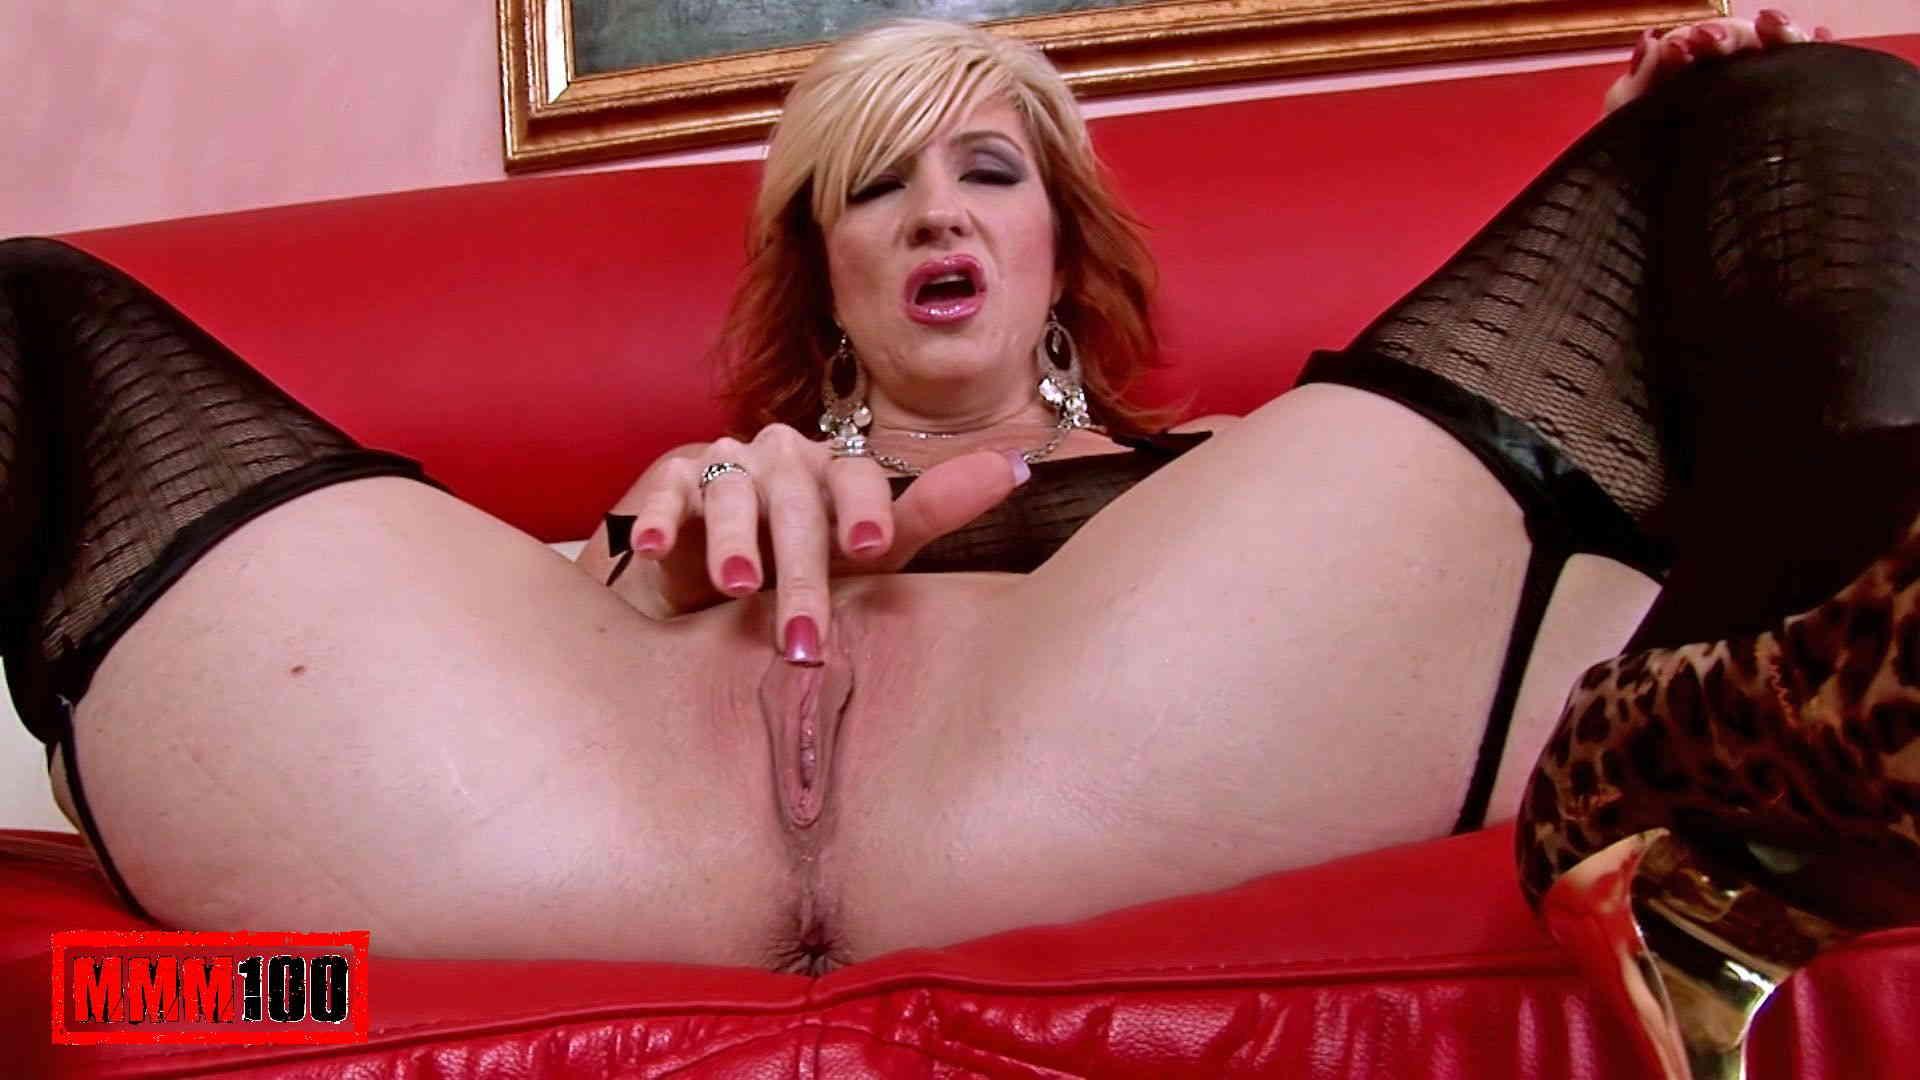 Monica Hq mature slut pics compilation